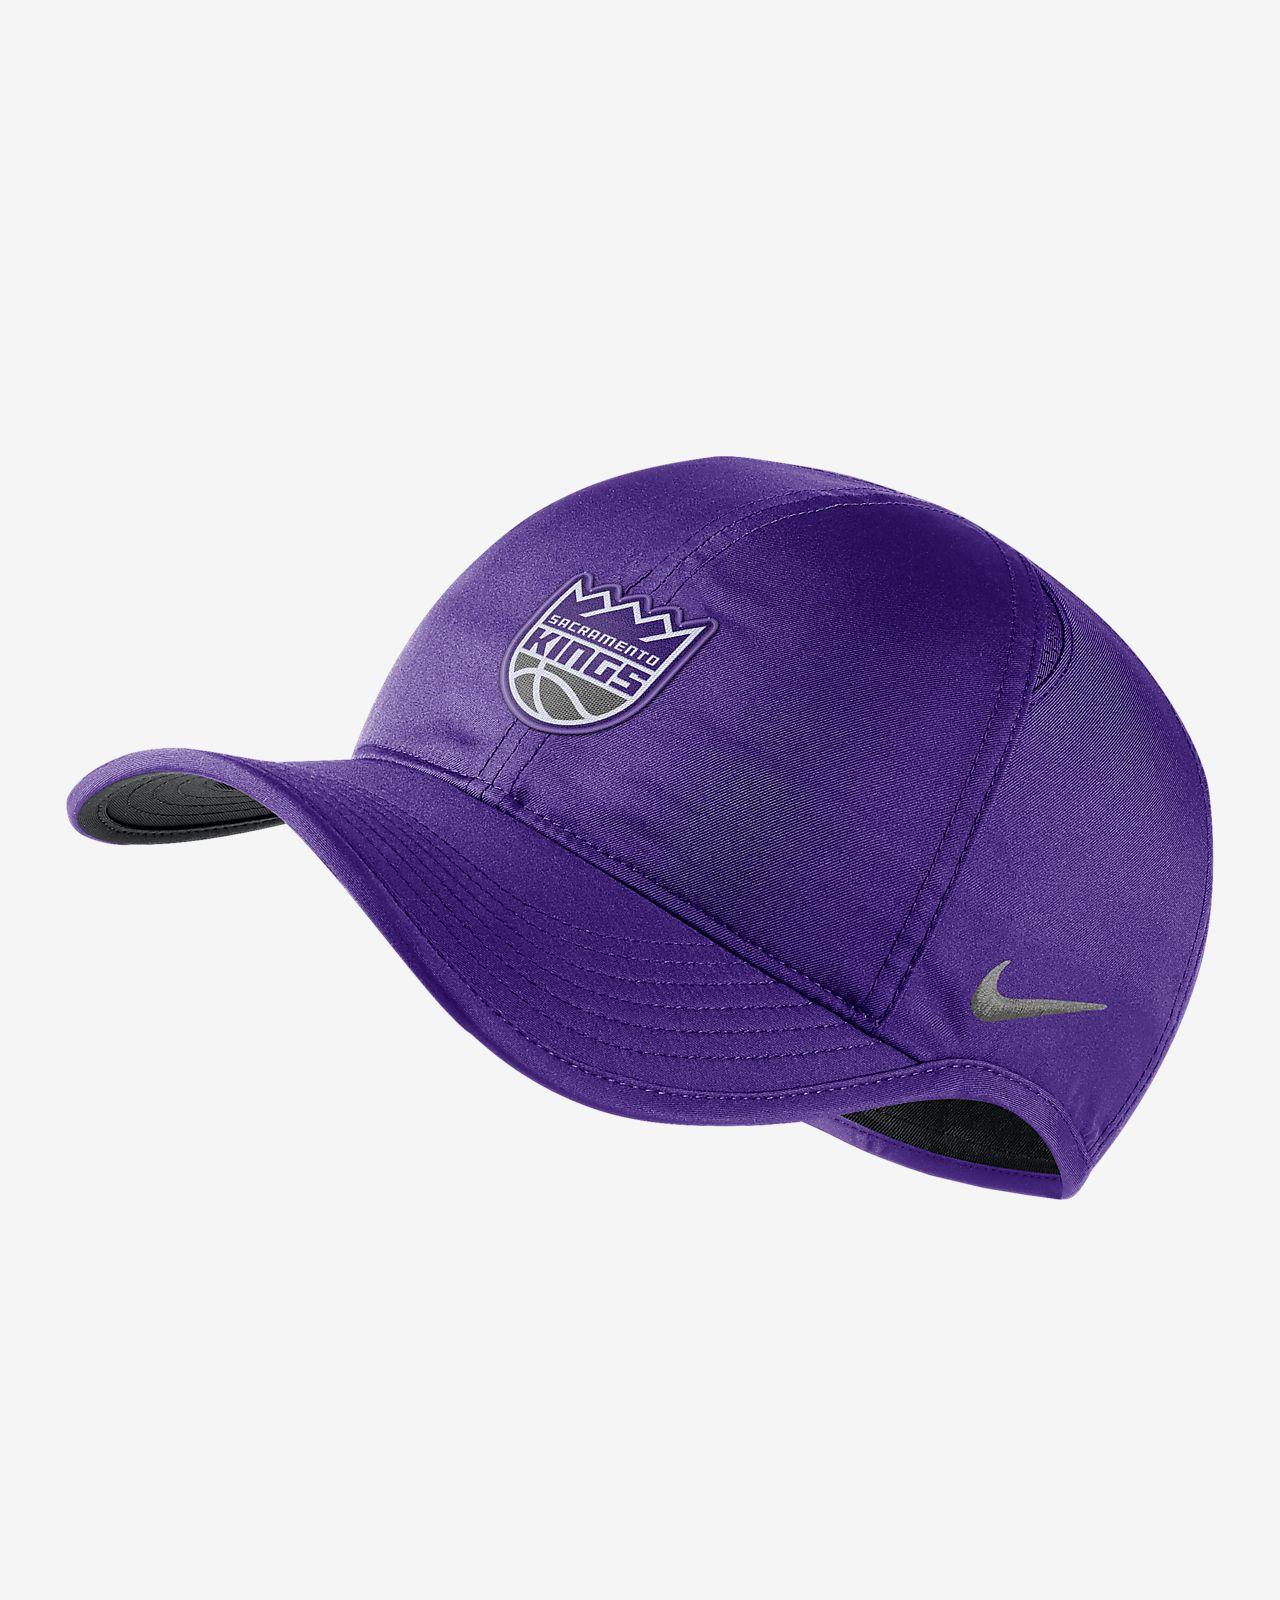 4a56197297a Sacramento Kings Nike AeroBill Featherlight NBA Hat. Nike.com